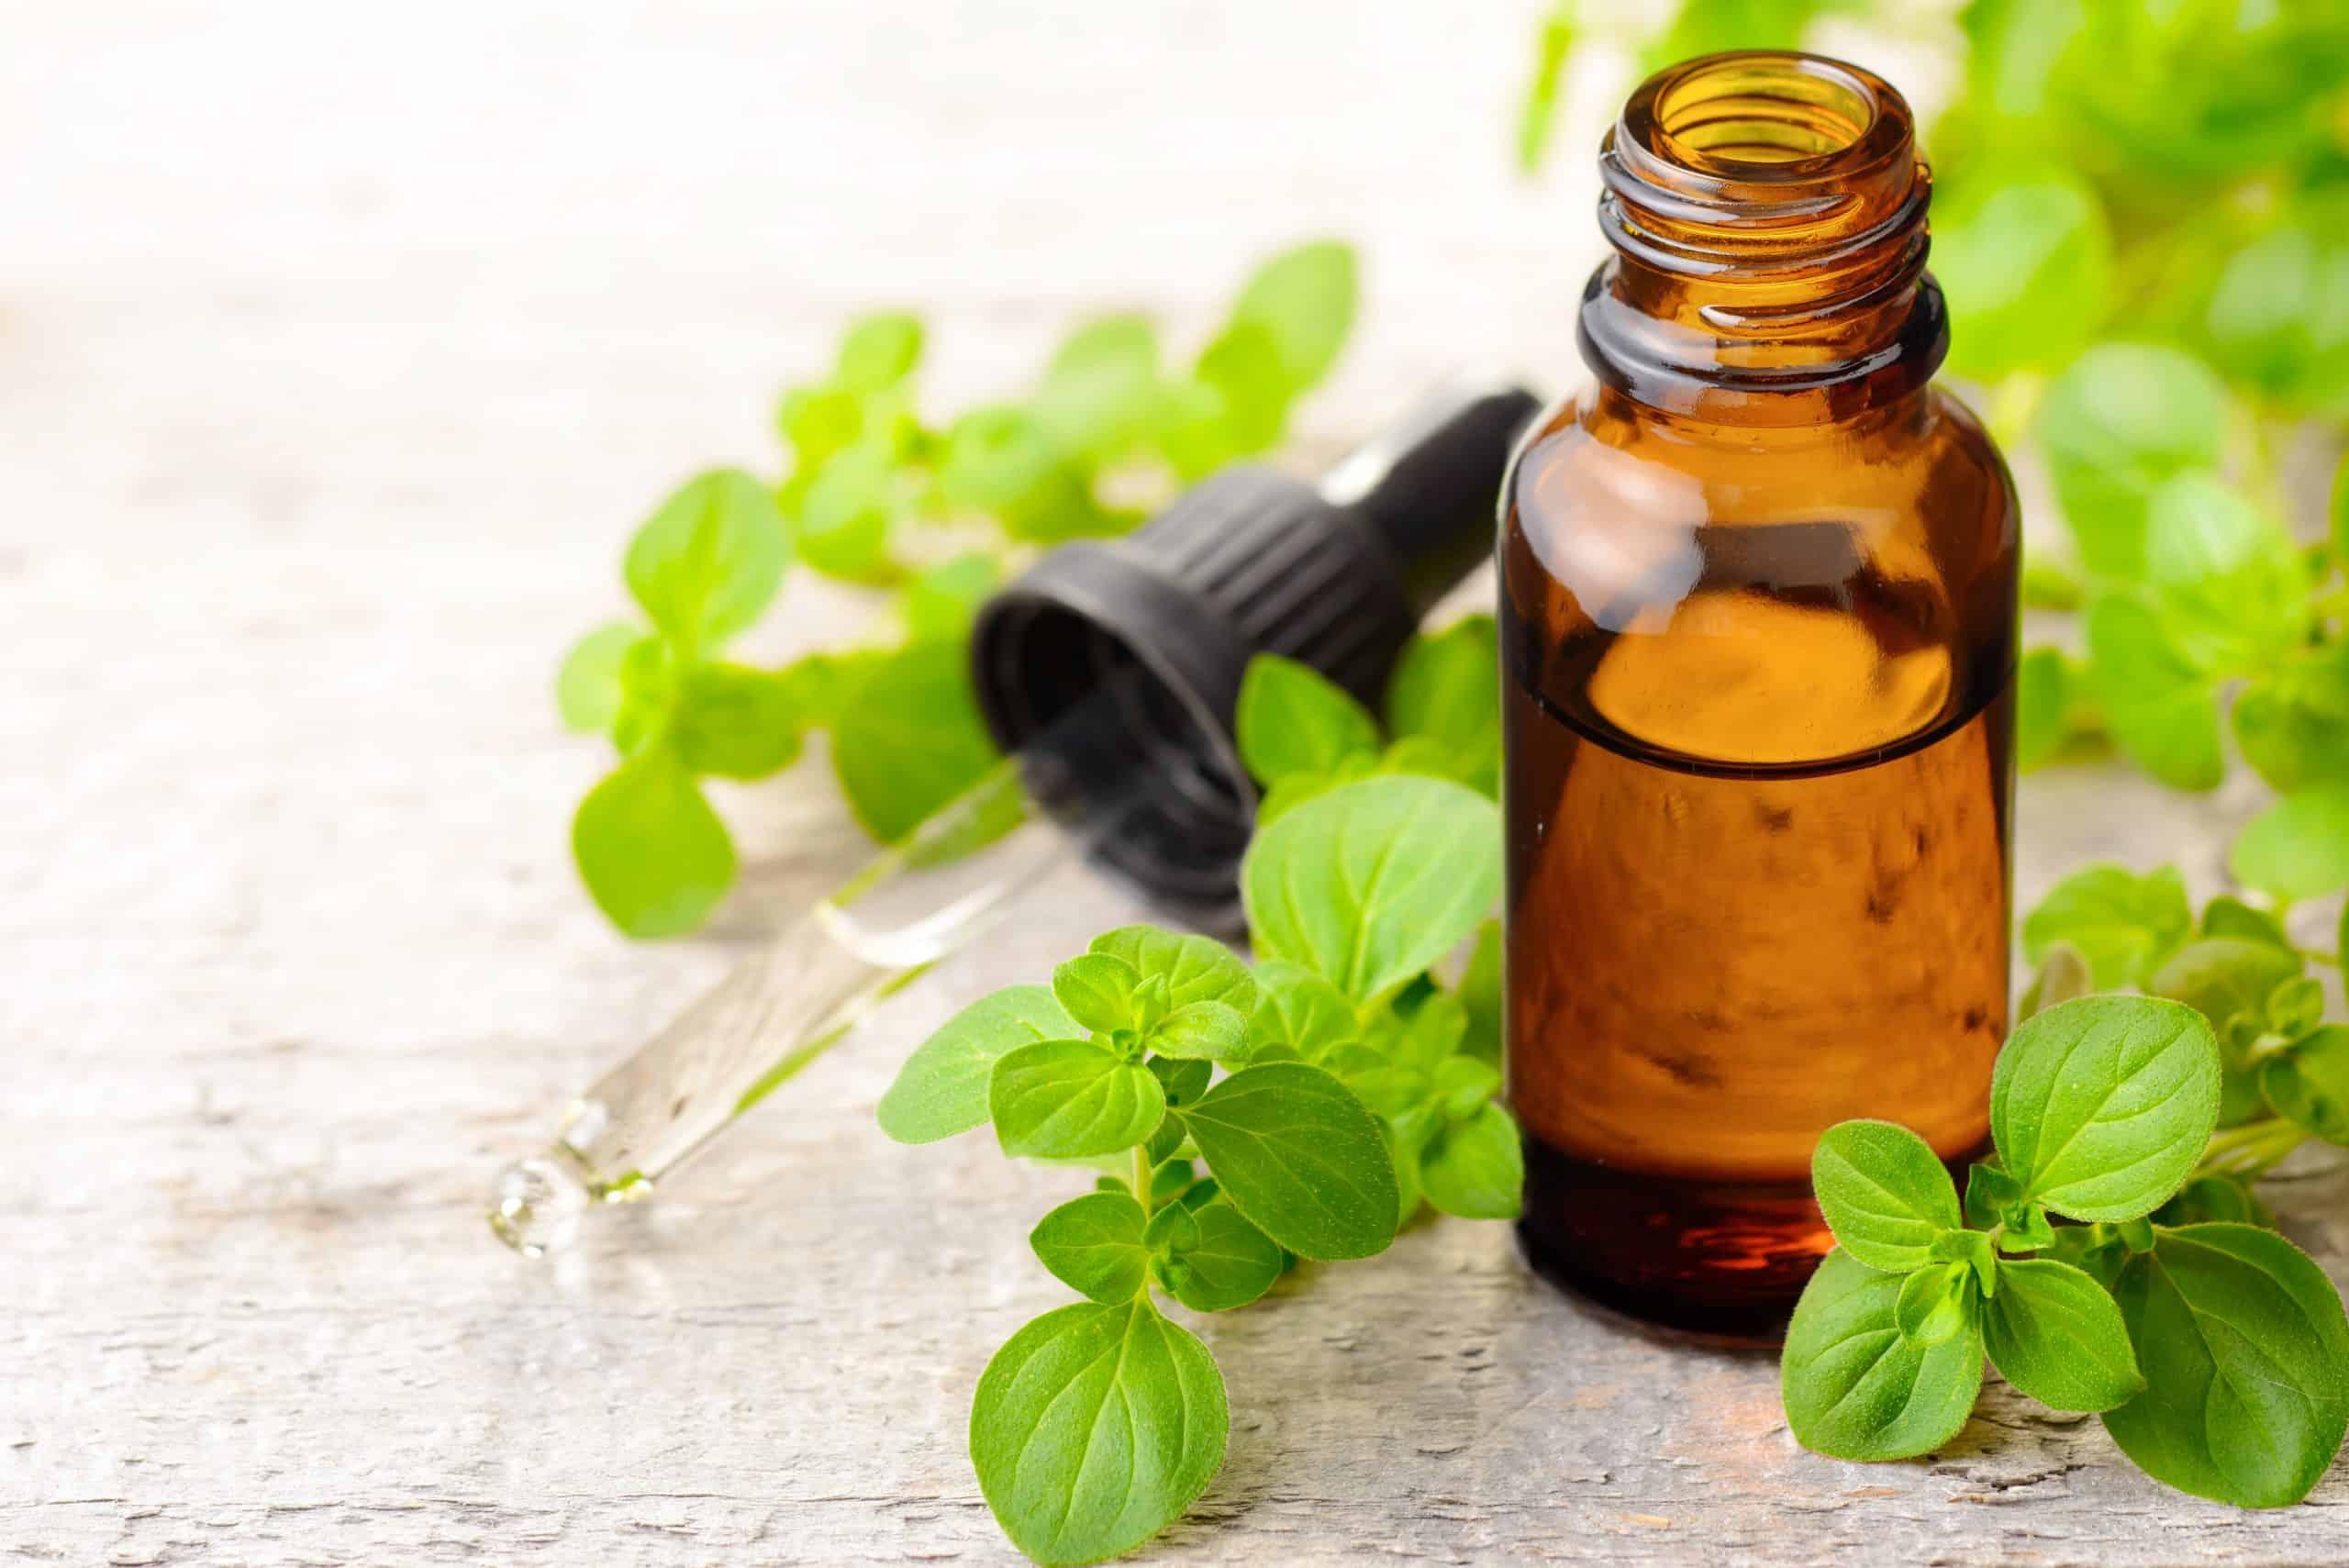 oregano oil for dogs natural antibiotic